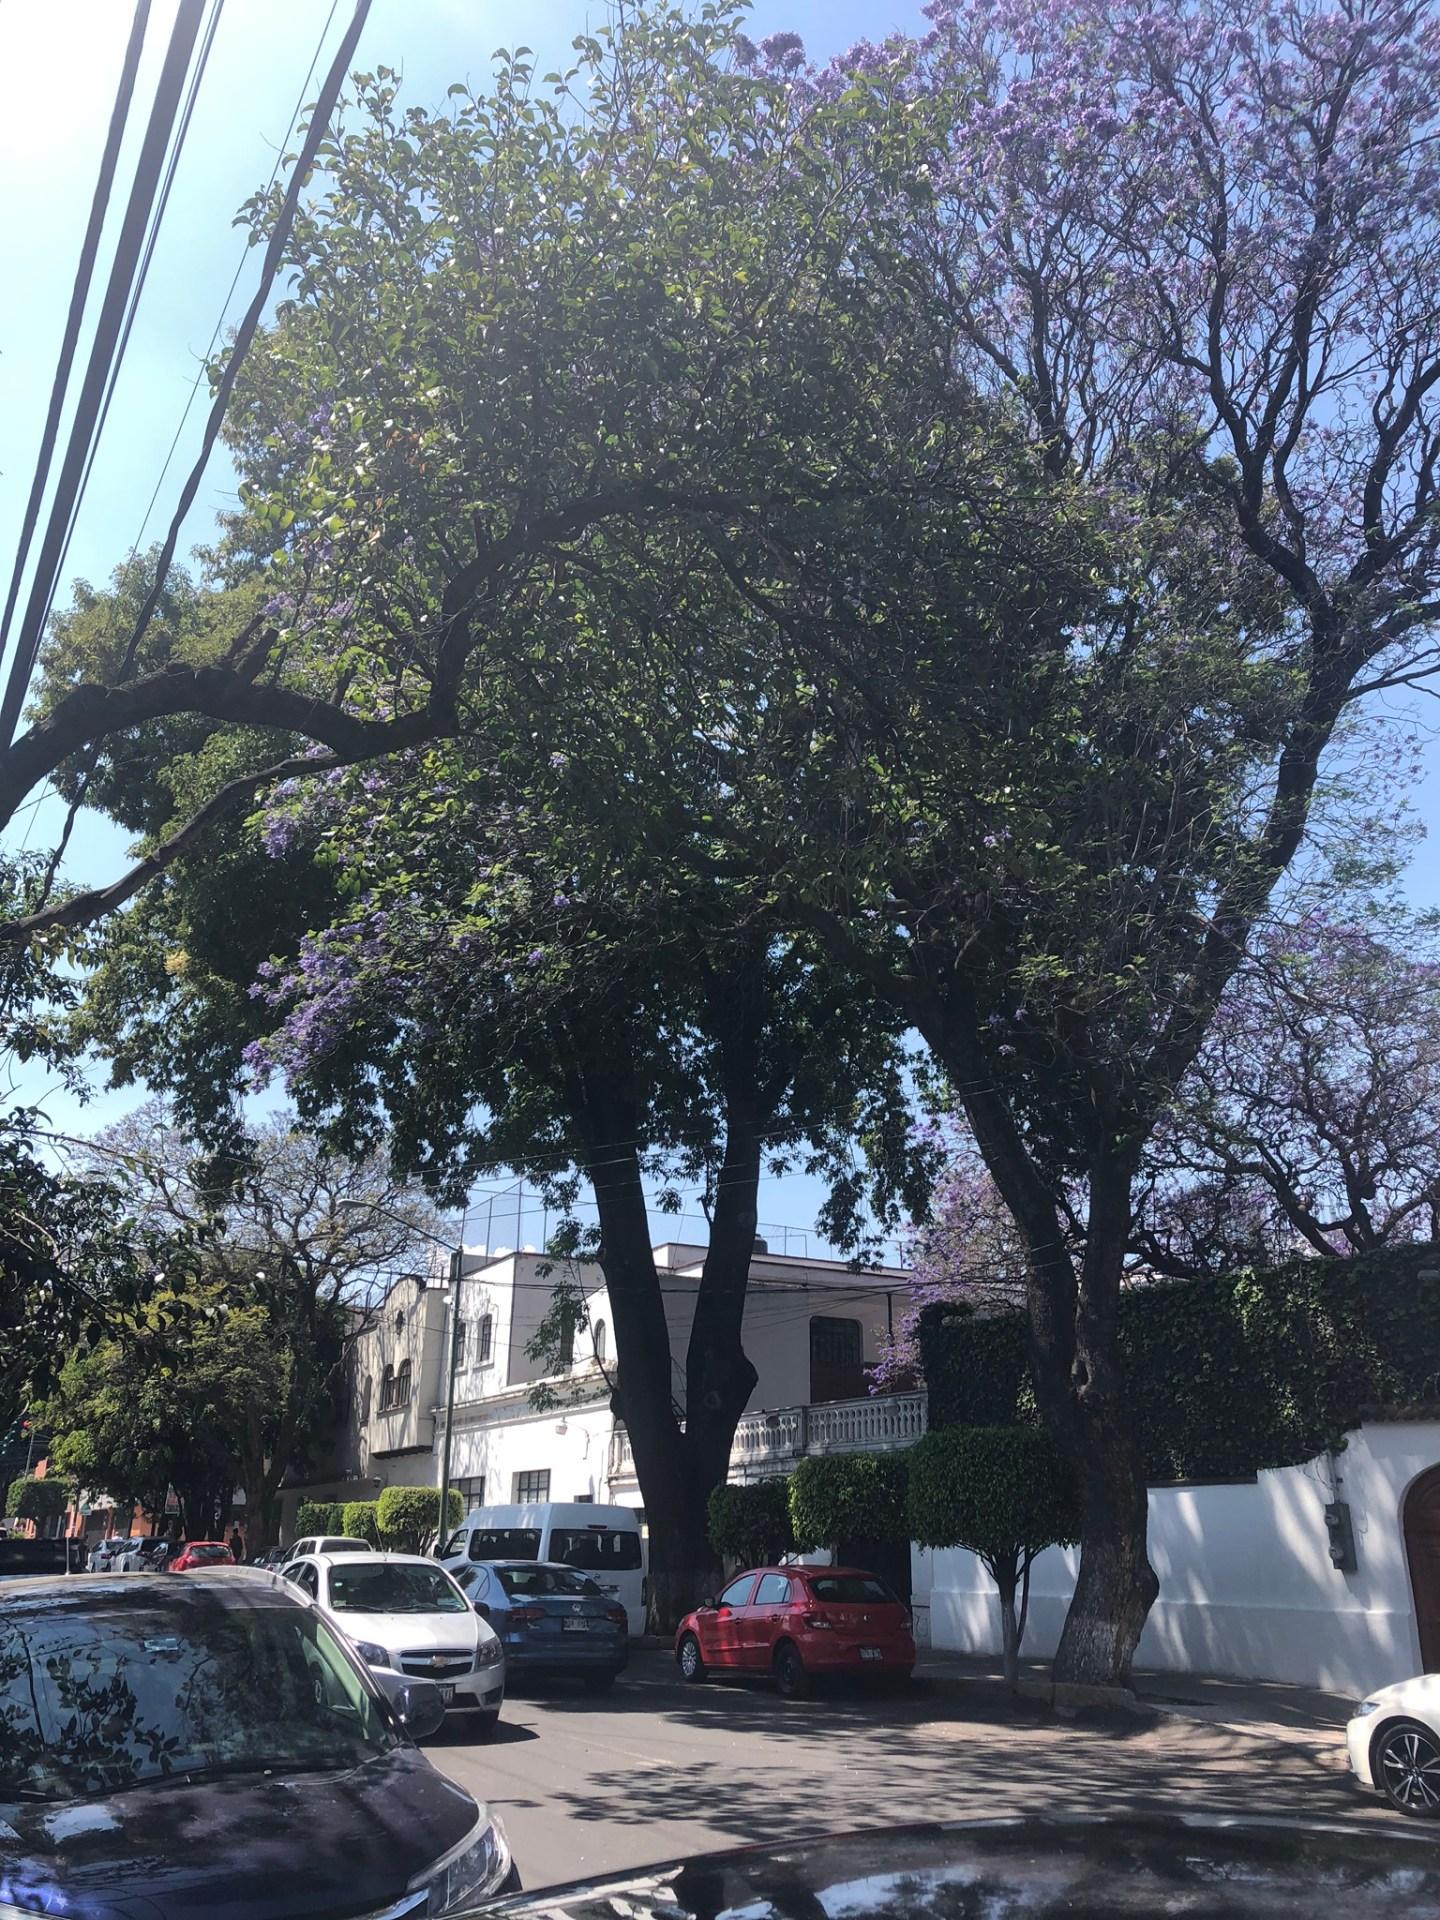 Coyoacan neighbourhood, Mexico City